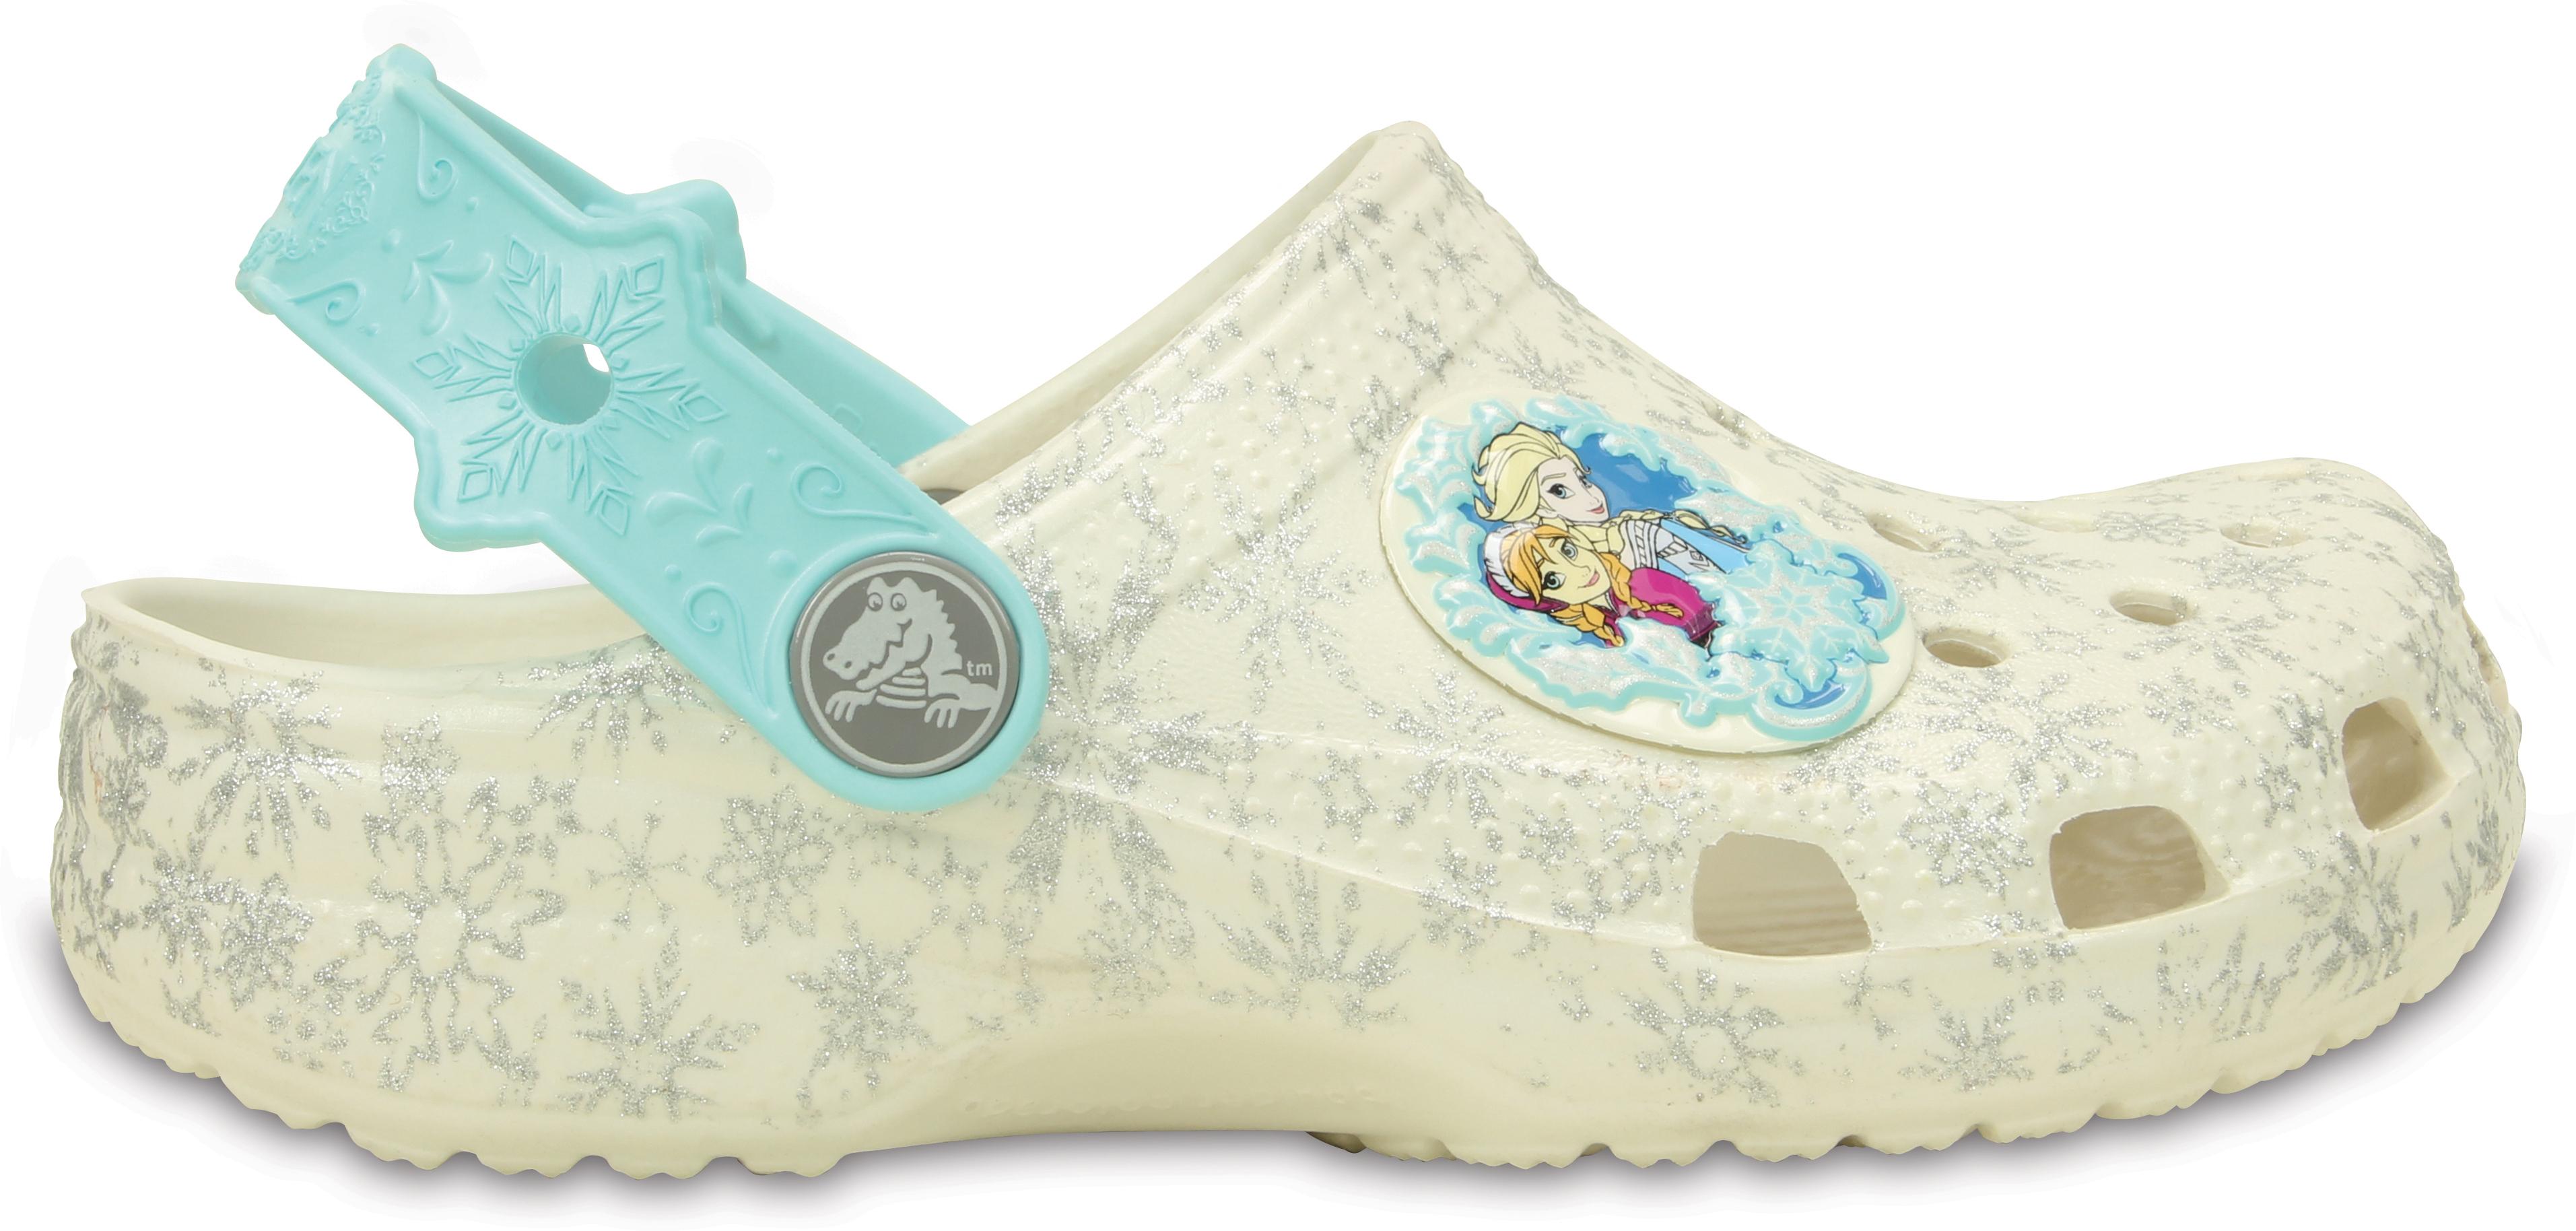 Crocs Classic Frozen Clog Kids - Oyster C4C5